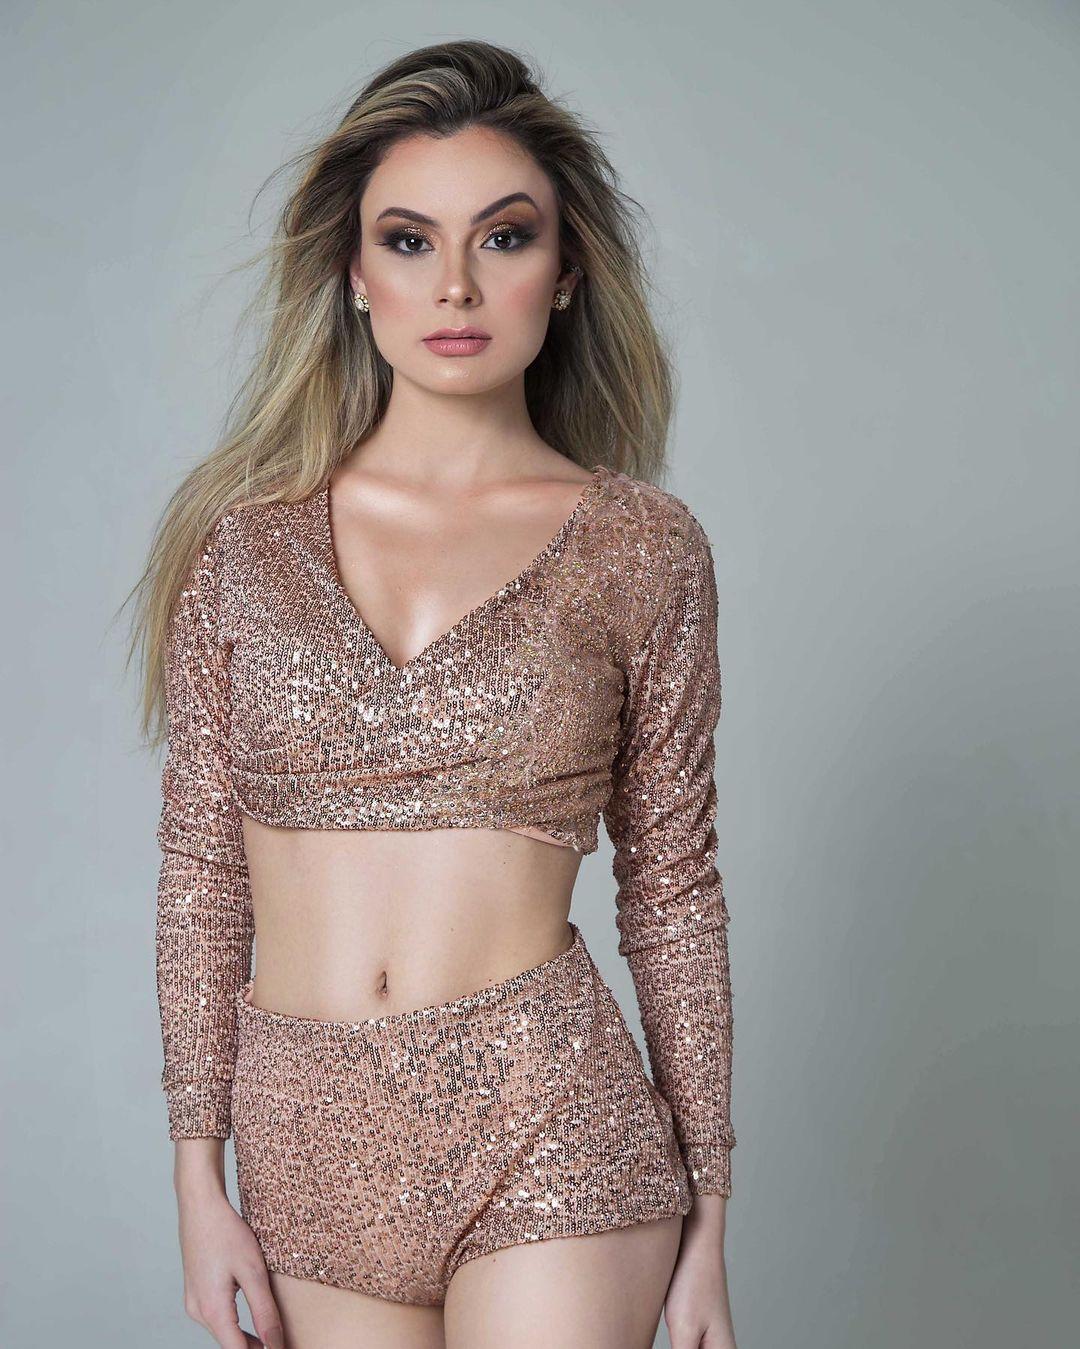 thais bonome, miss beleza da grande sao paulo 2020/miss abcd mundo 2019. 12626213